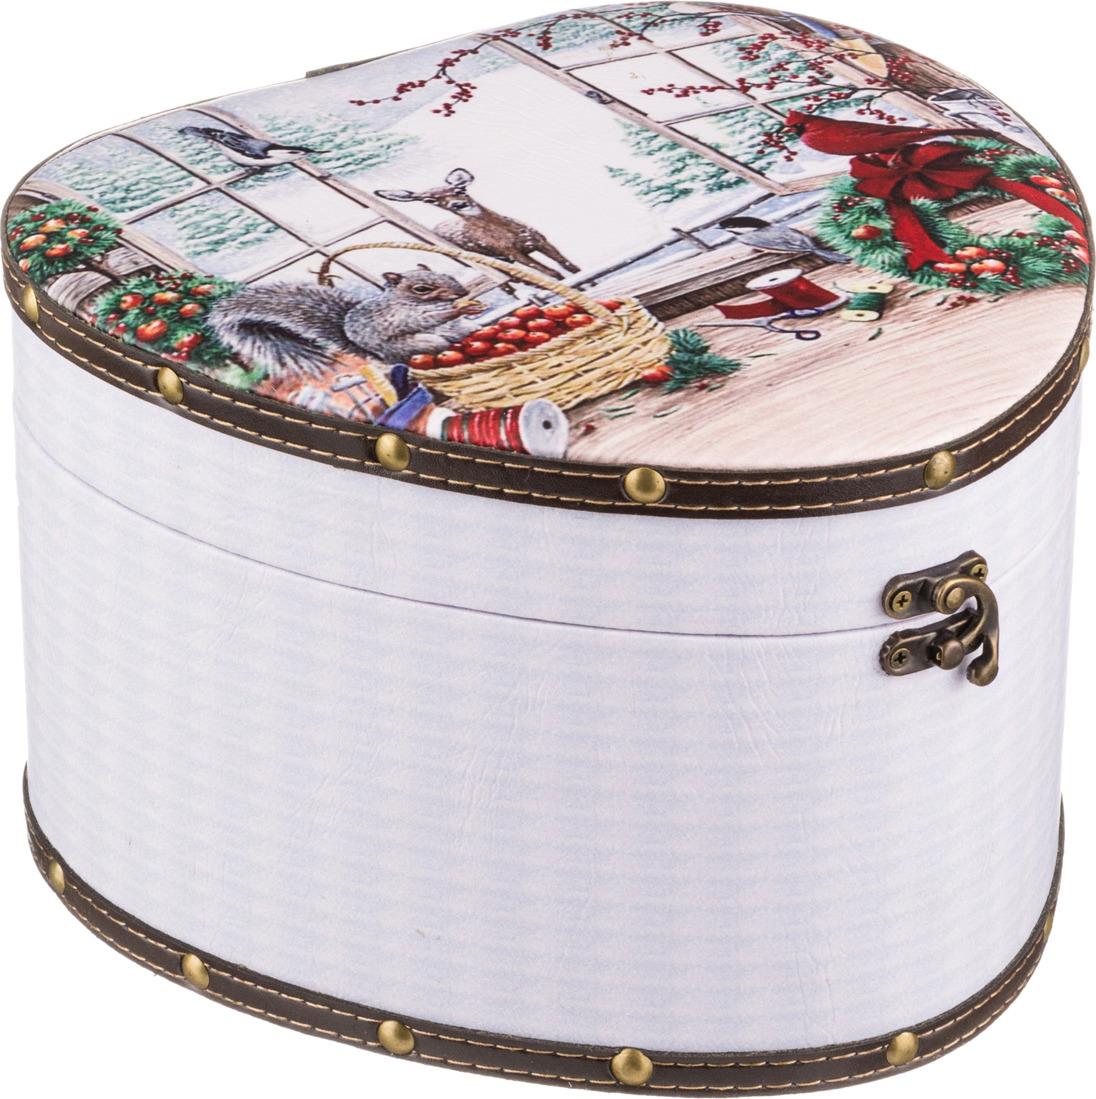 Набор шкатулок Lefard Новогодний интерьер, 41-338, 2 шт набор шкатулок для рукоделия win max 2 шт 80834